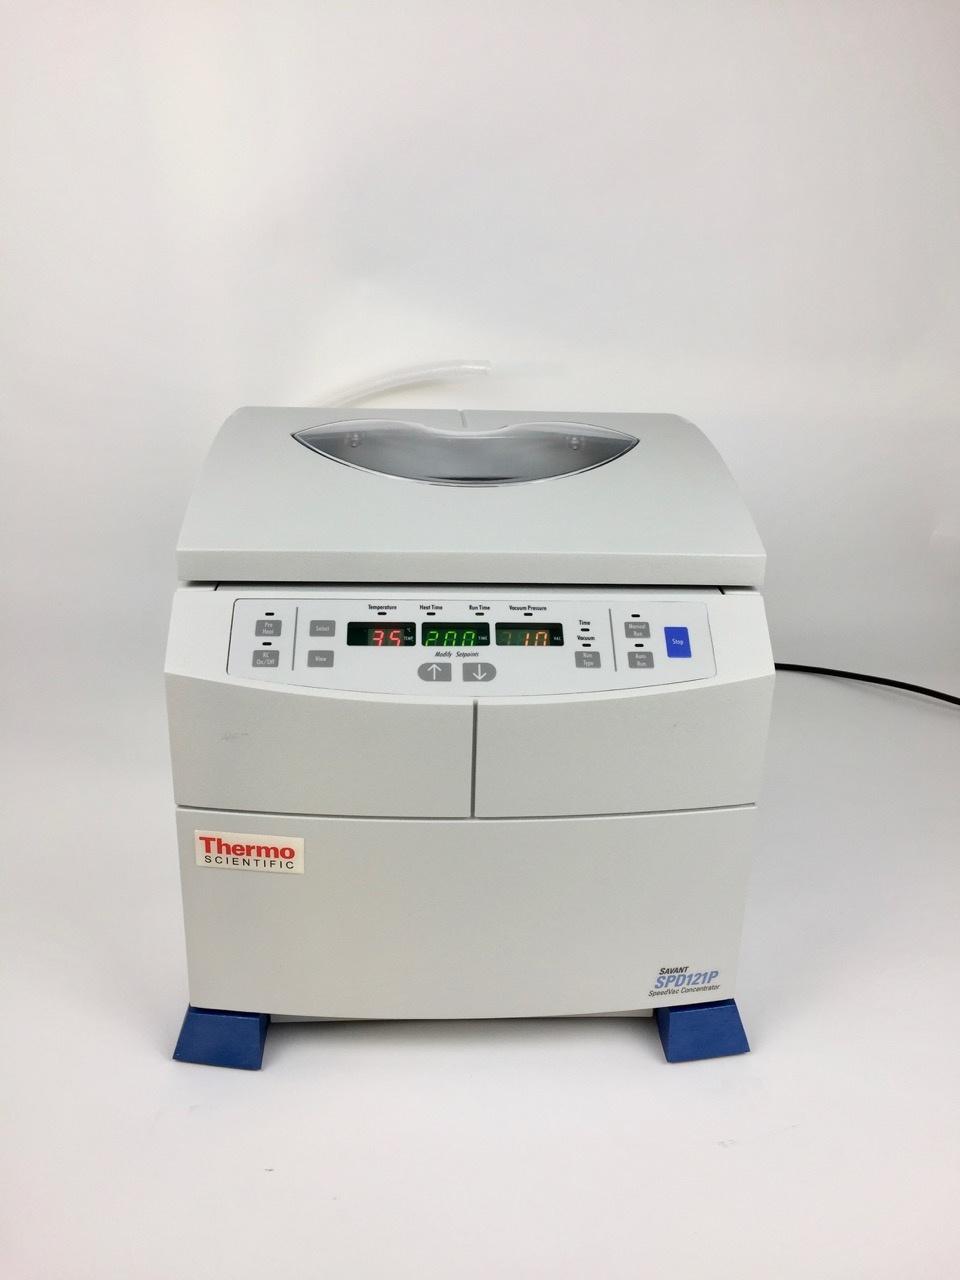 Thermo Scientific Thermo SPD121P SpeedVac-Konzentrator